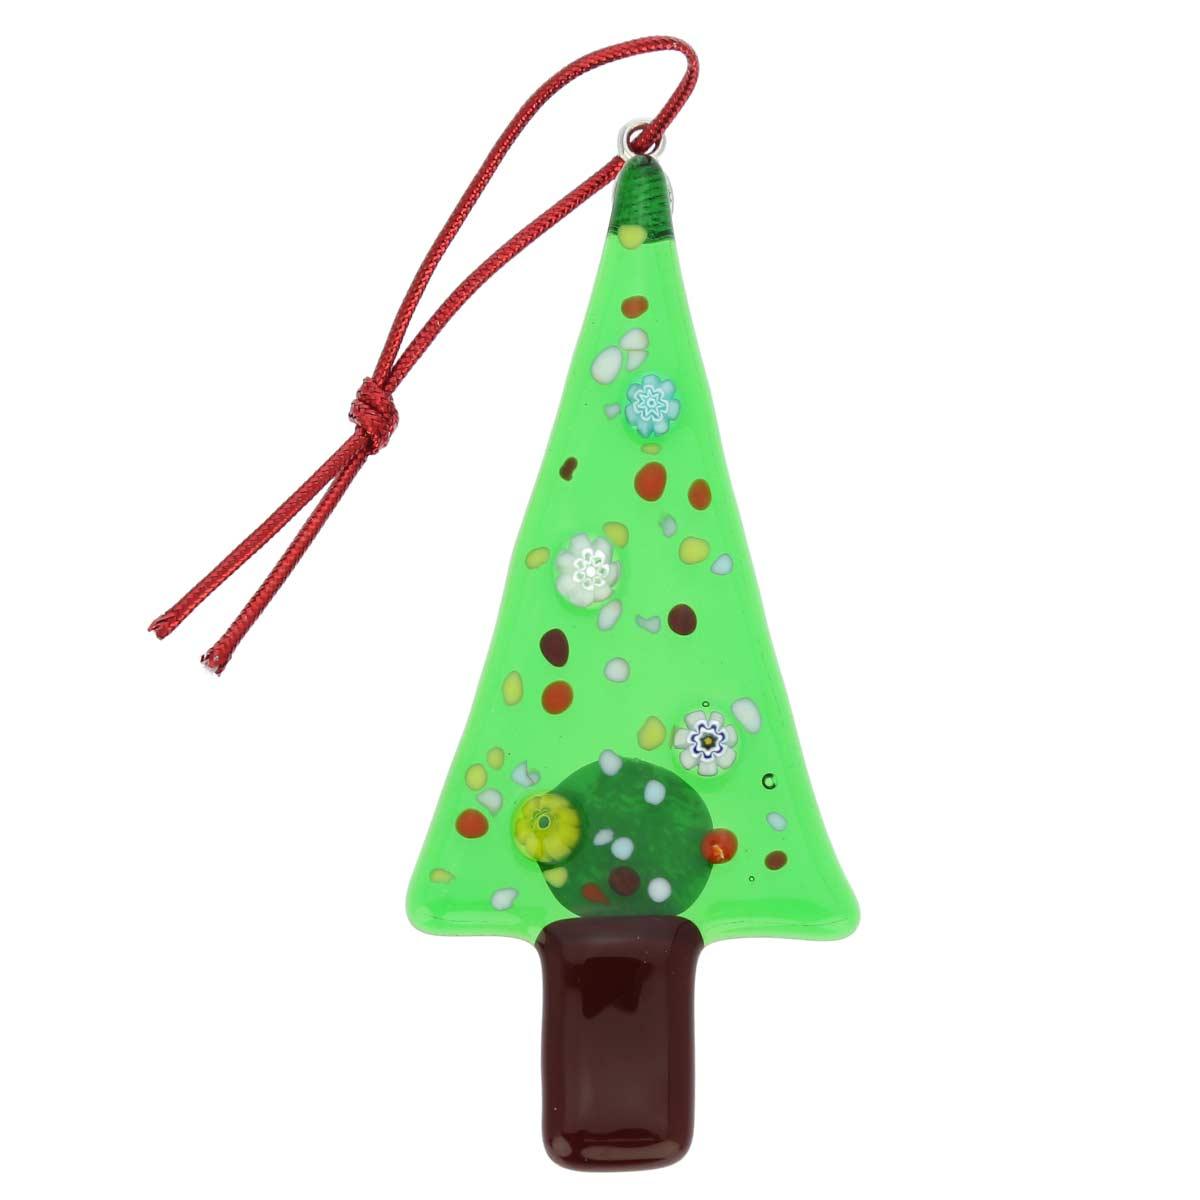 Murano glass christmas tree ornament - Murano glass ornaments italy ...